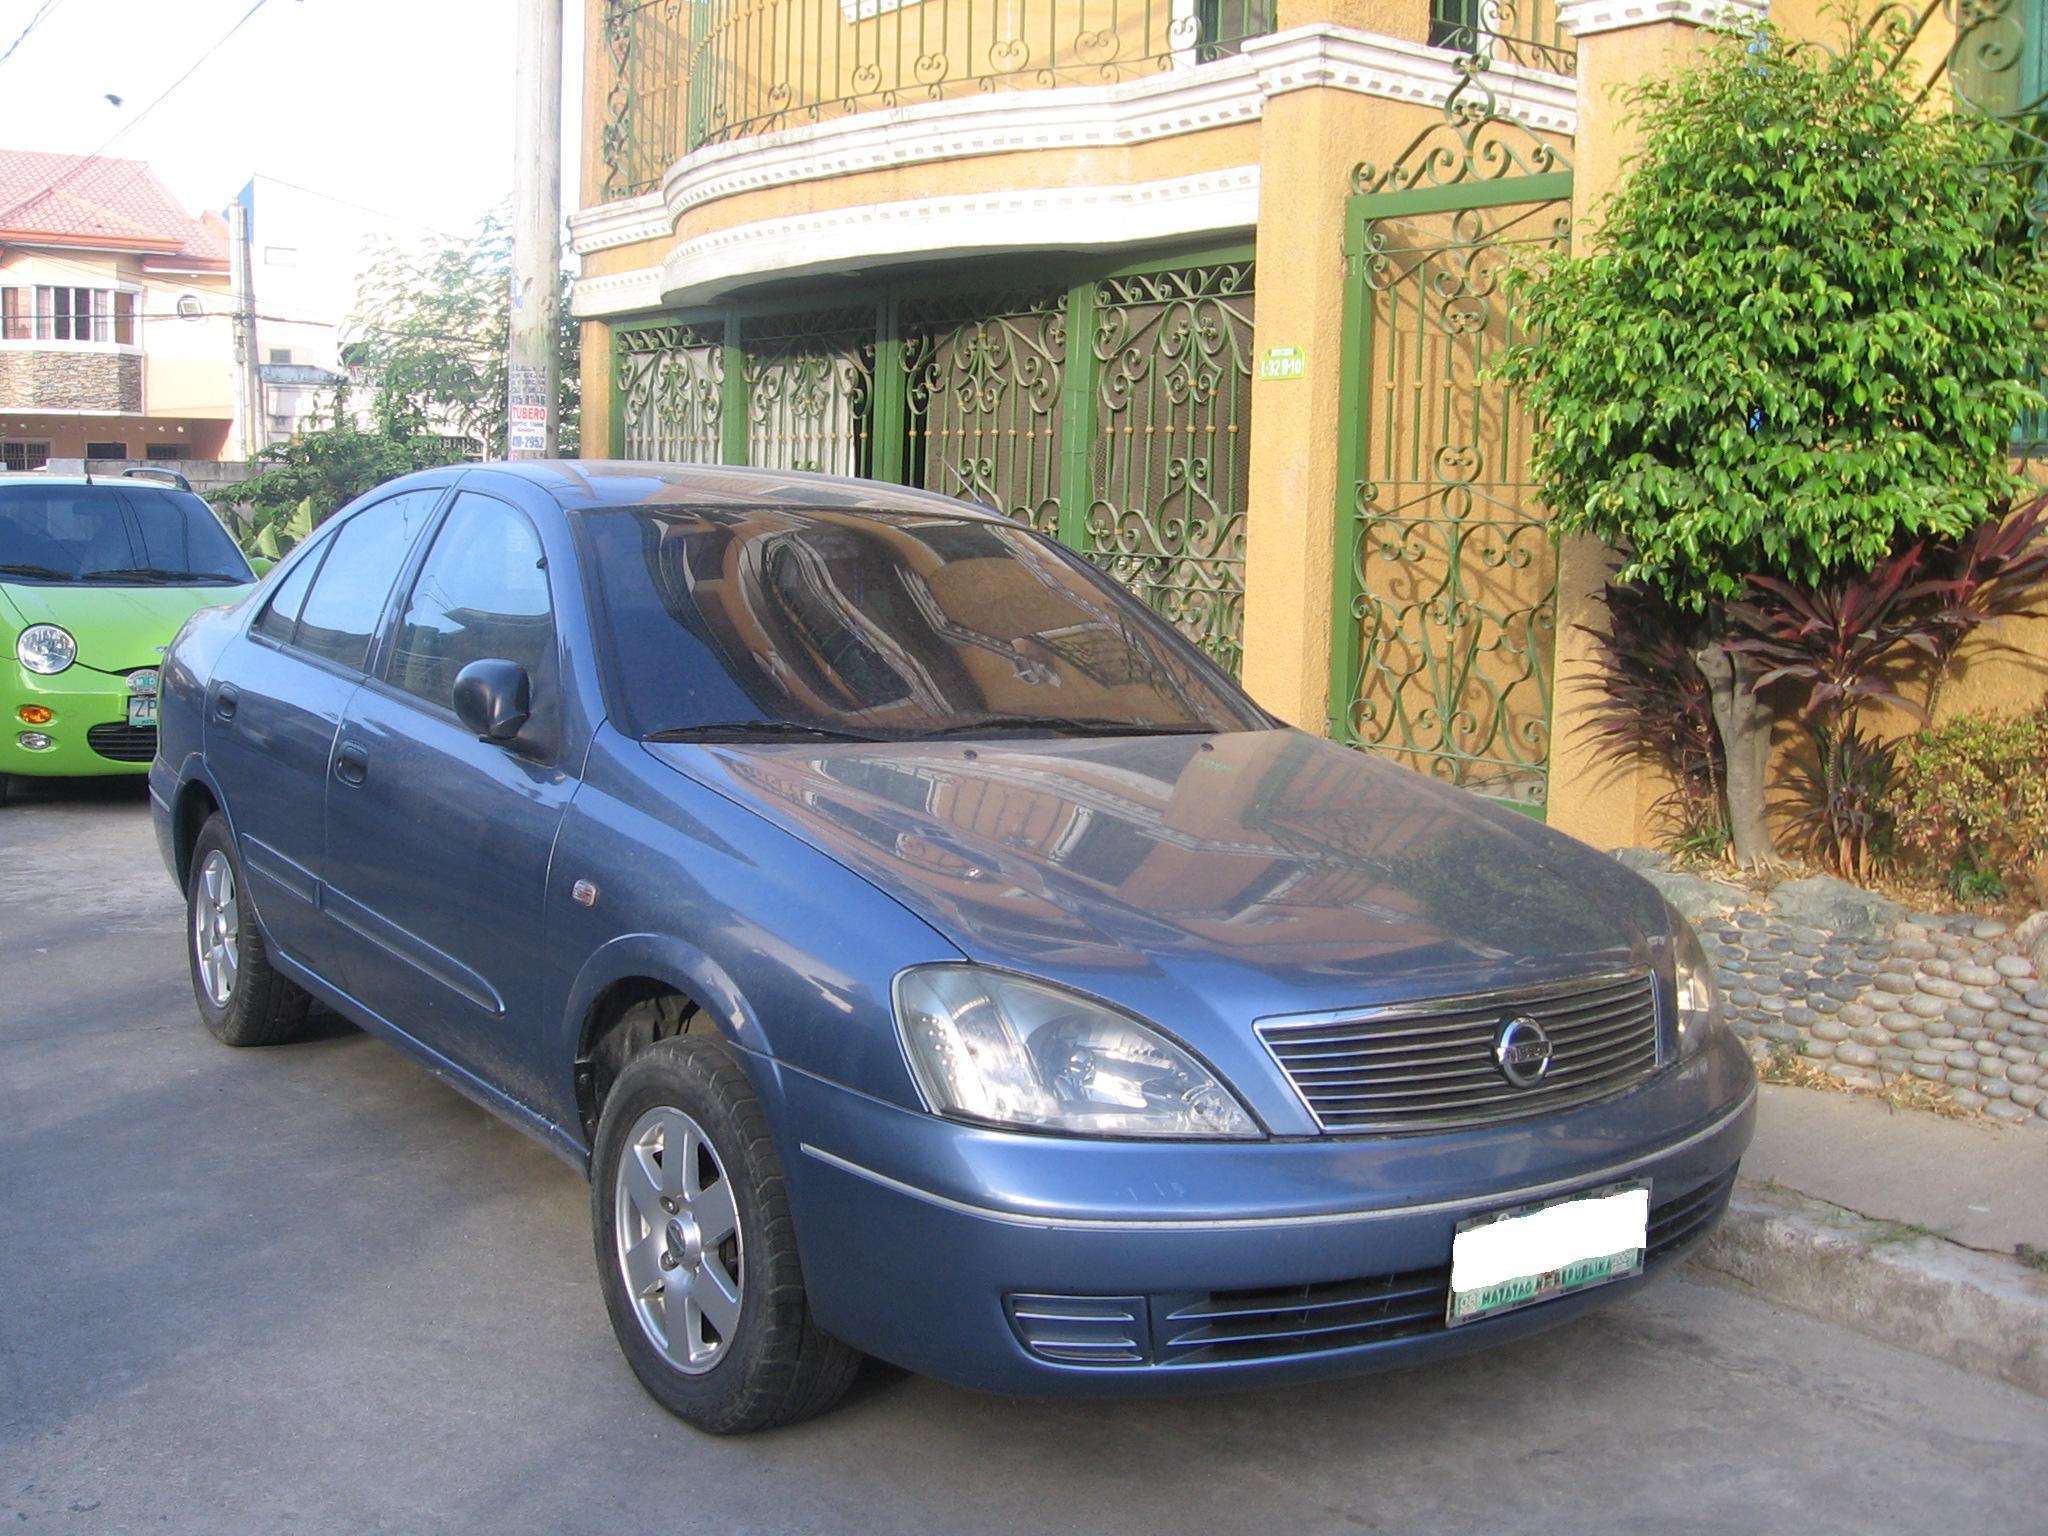 nissan sunny n16 2000 2005 sedan outstanding cars rh carsot com 1978 Datsun 210 1978 Datsun 210